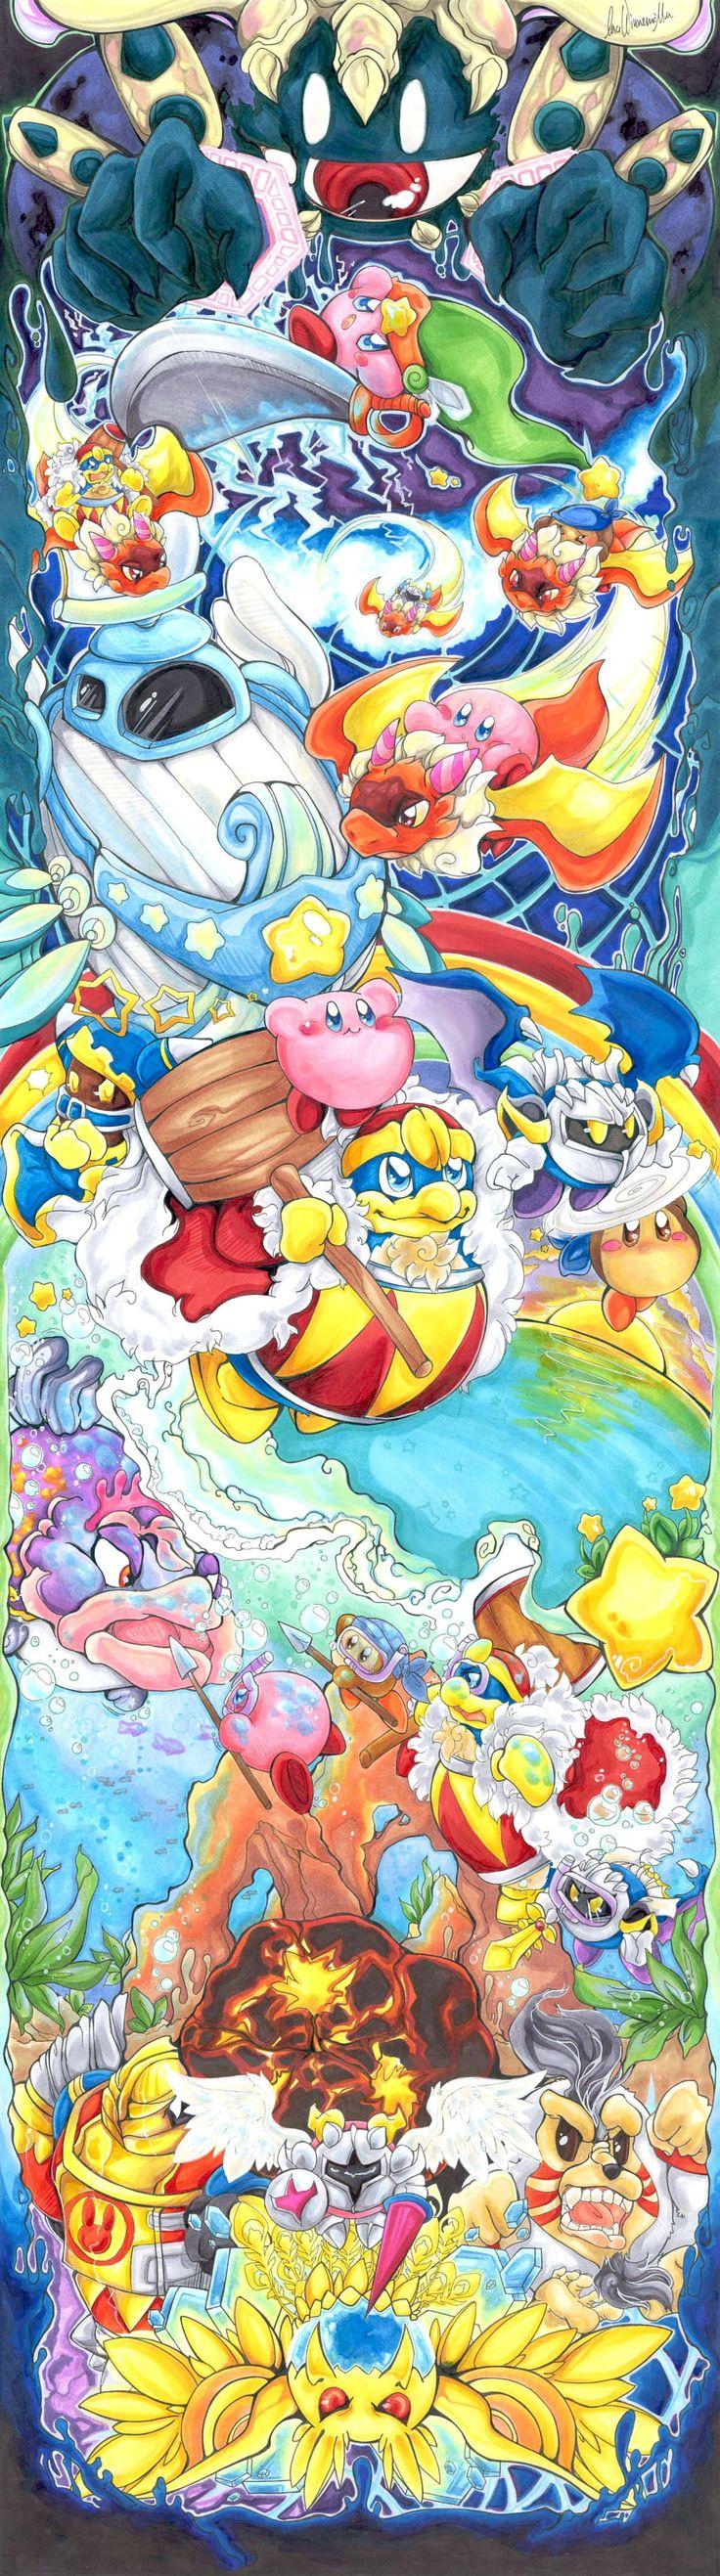 Return To Dreamland Wallscroll by HisuiVirus.deviantart.com on @deviantART